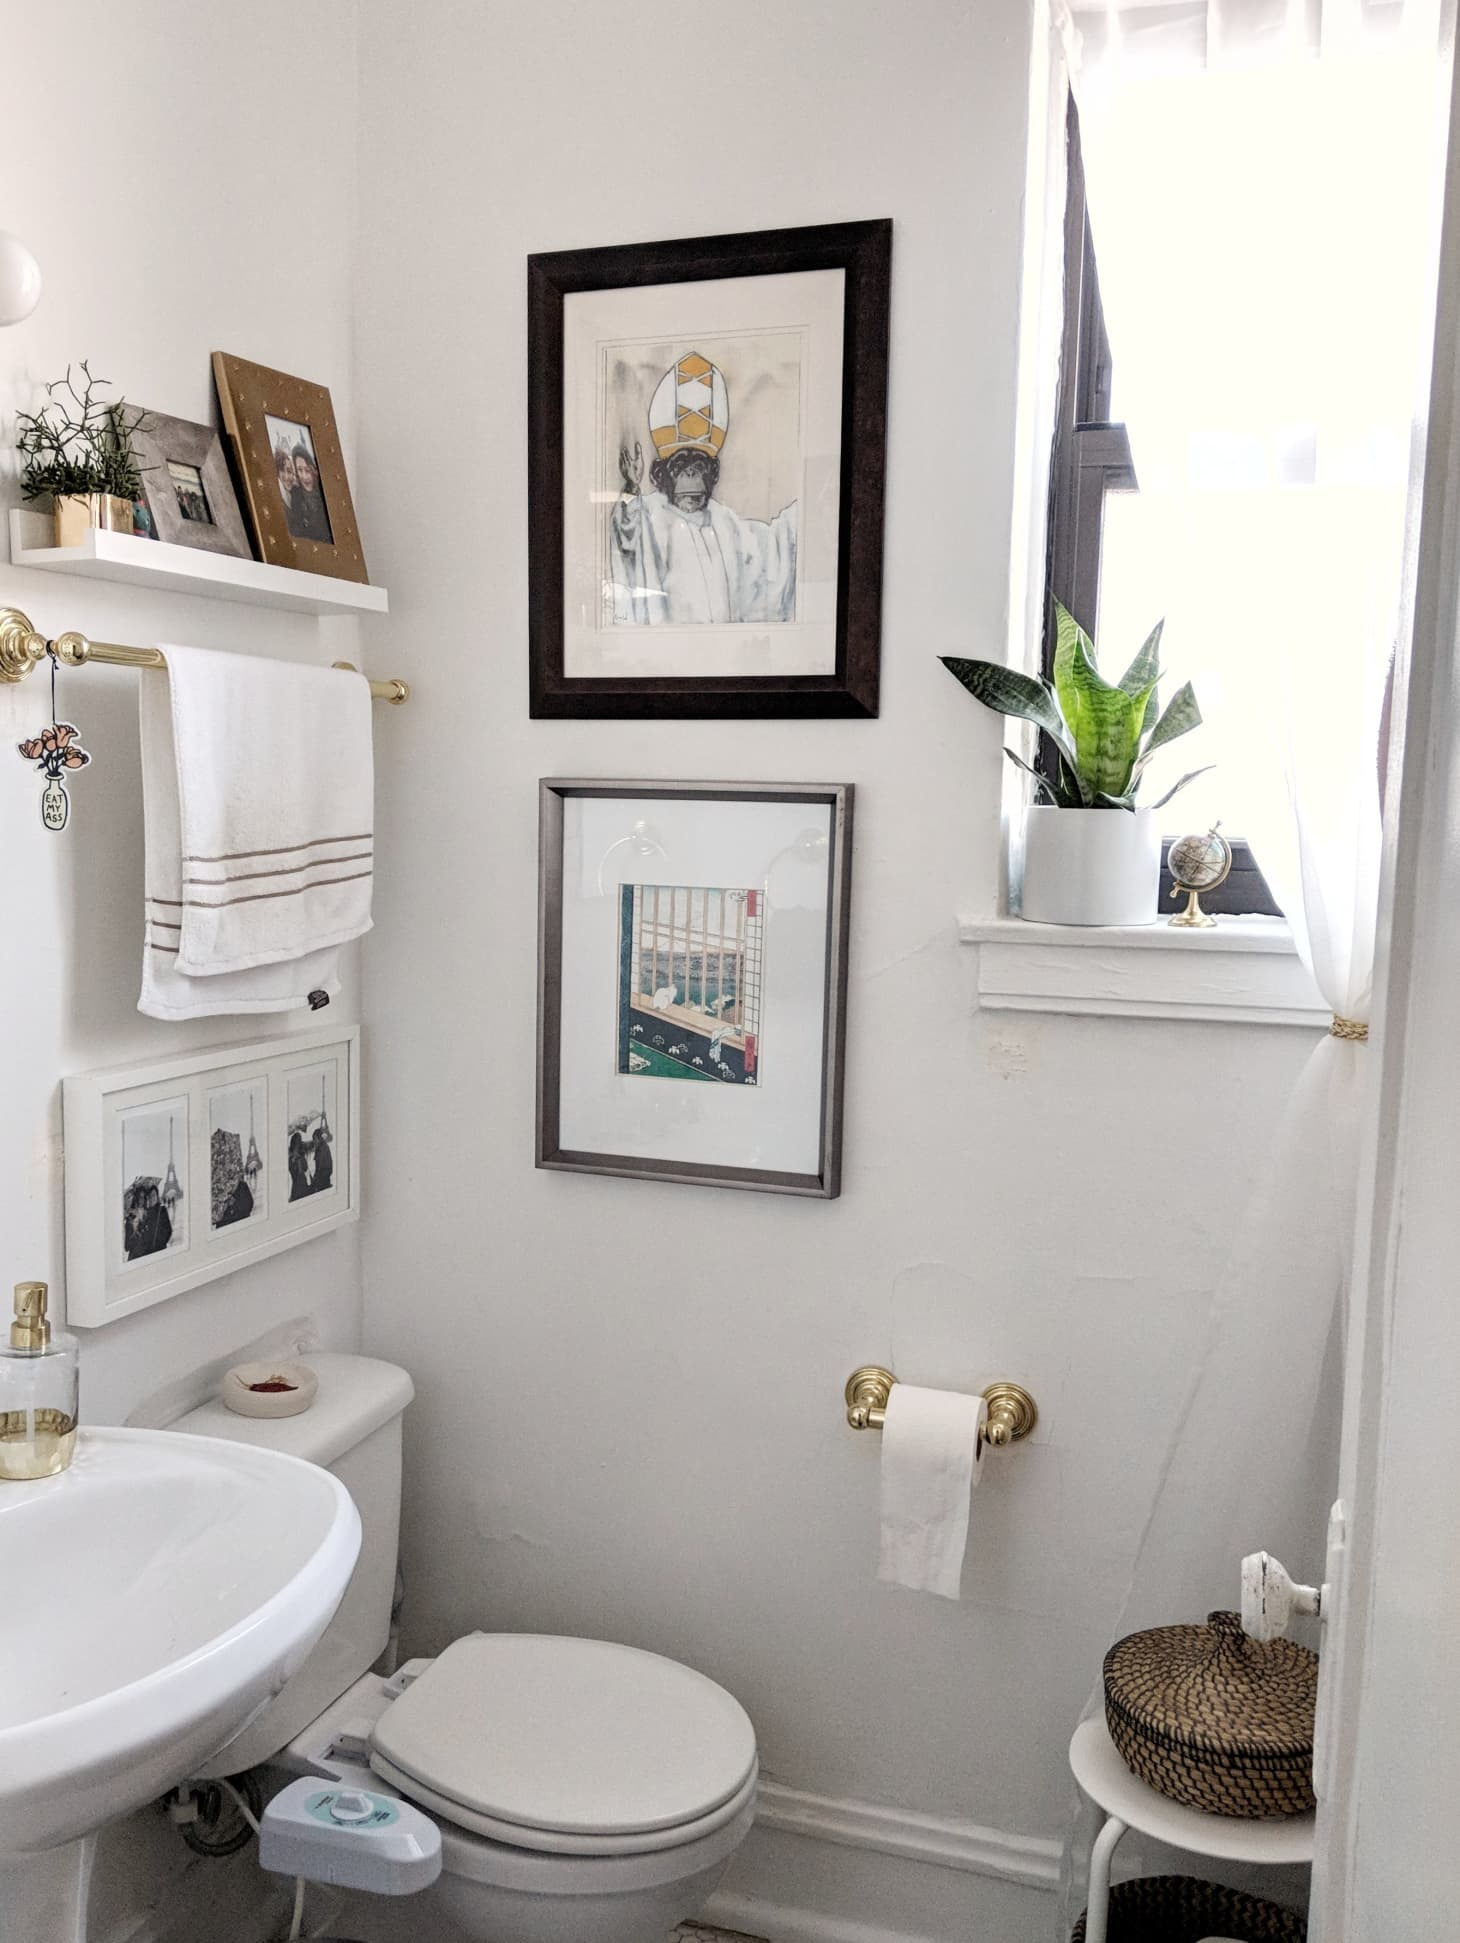 25 Small Bathroom Storage & Design Ideas - Storage ... on Small Apartment Bathroom Storage Ideas  id=81627